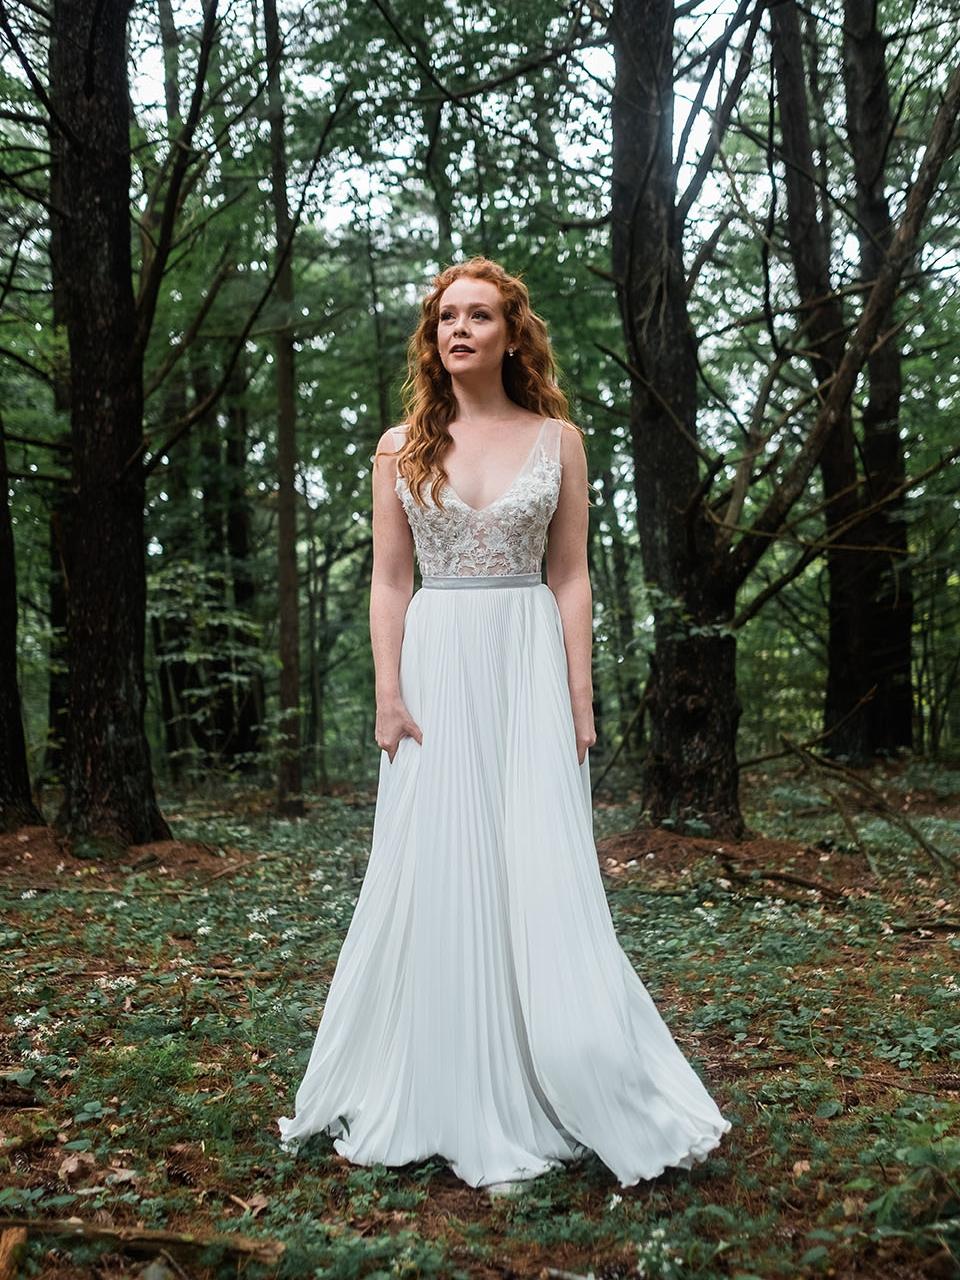 rebecca_schoneveld_quinn_gown_applique_bodice_pleated_skirt_romantic_5.jpg